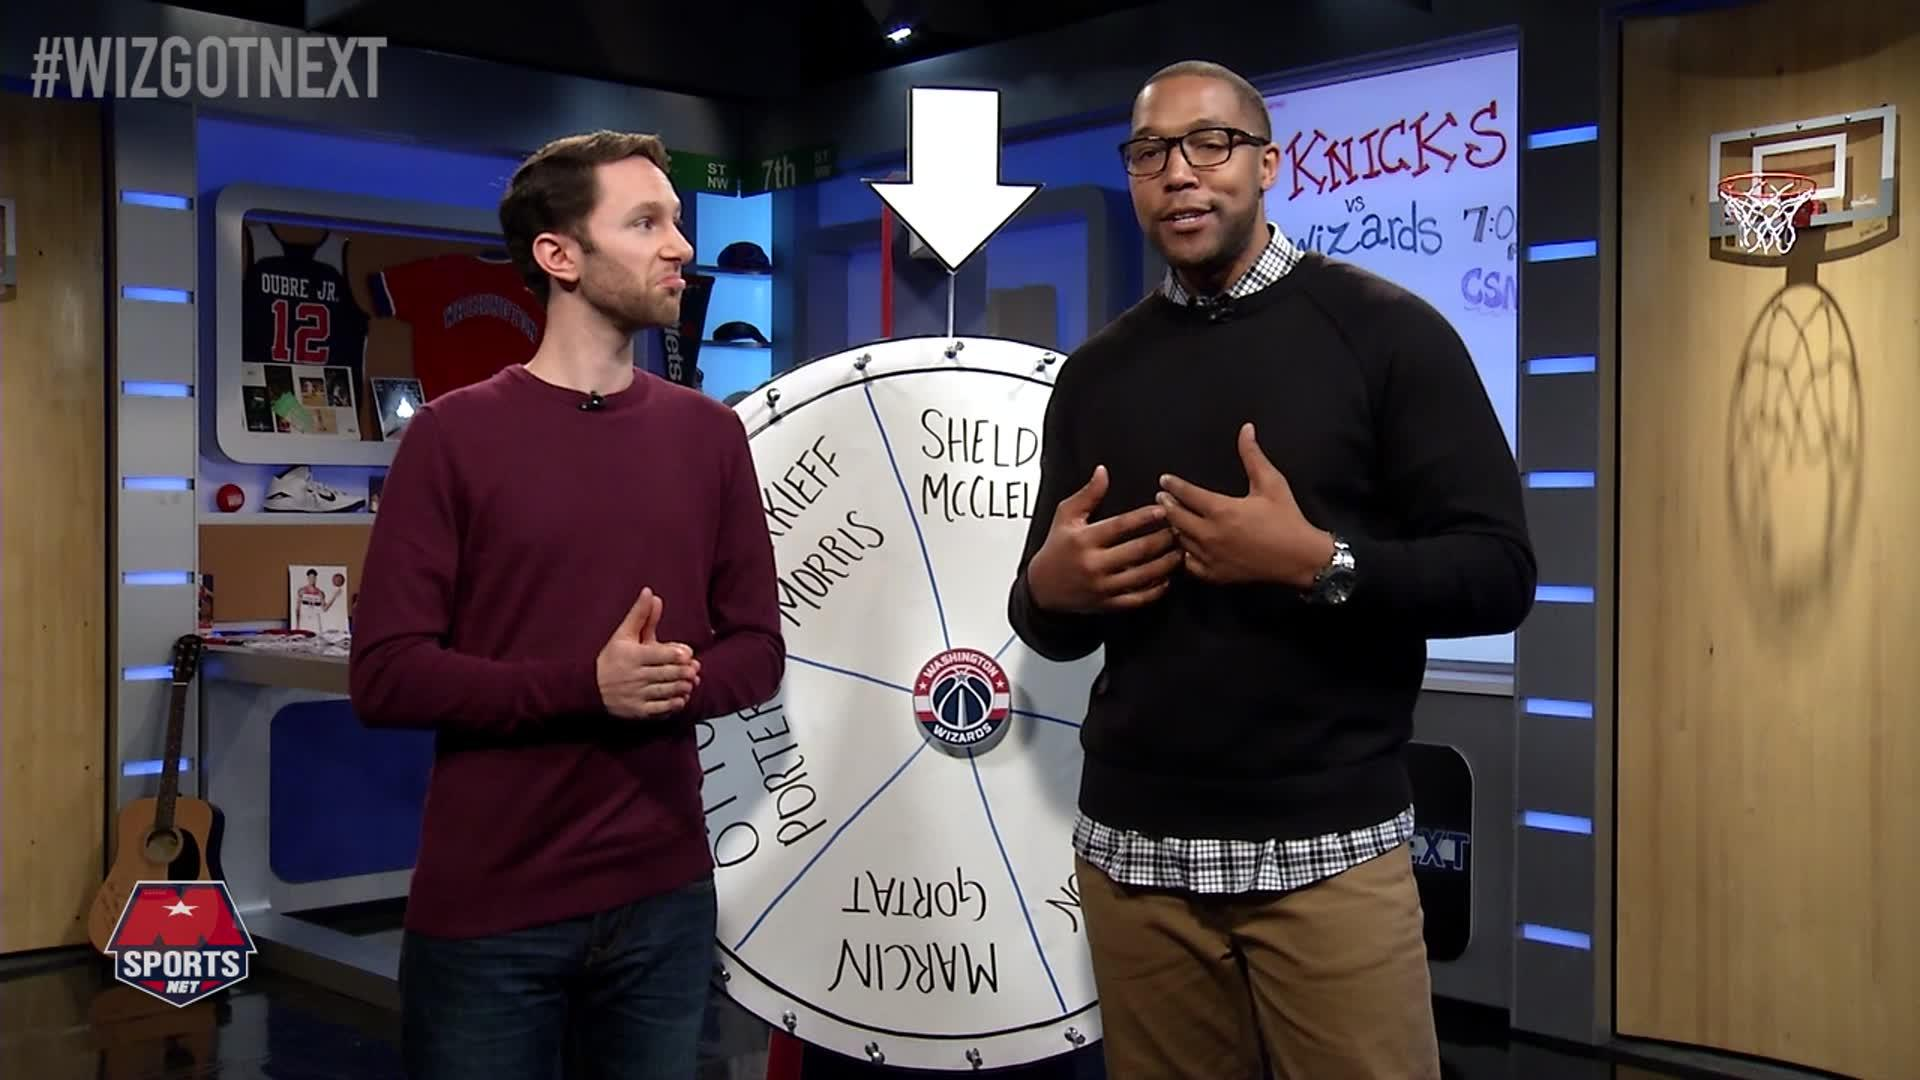 Wiz Got Next Pt 2 - Knicks vs. Wizards 11-17-16